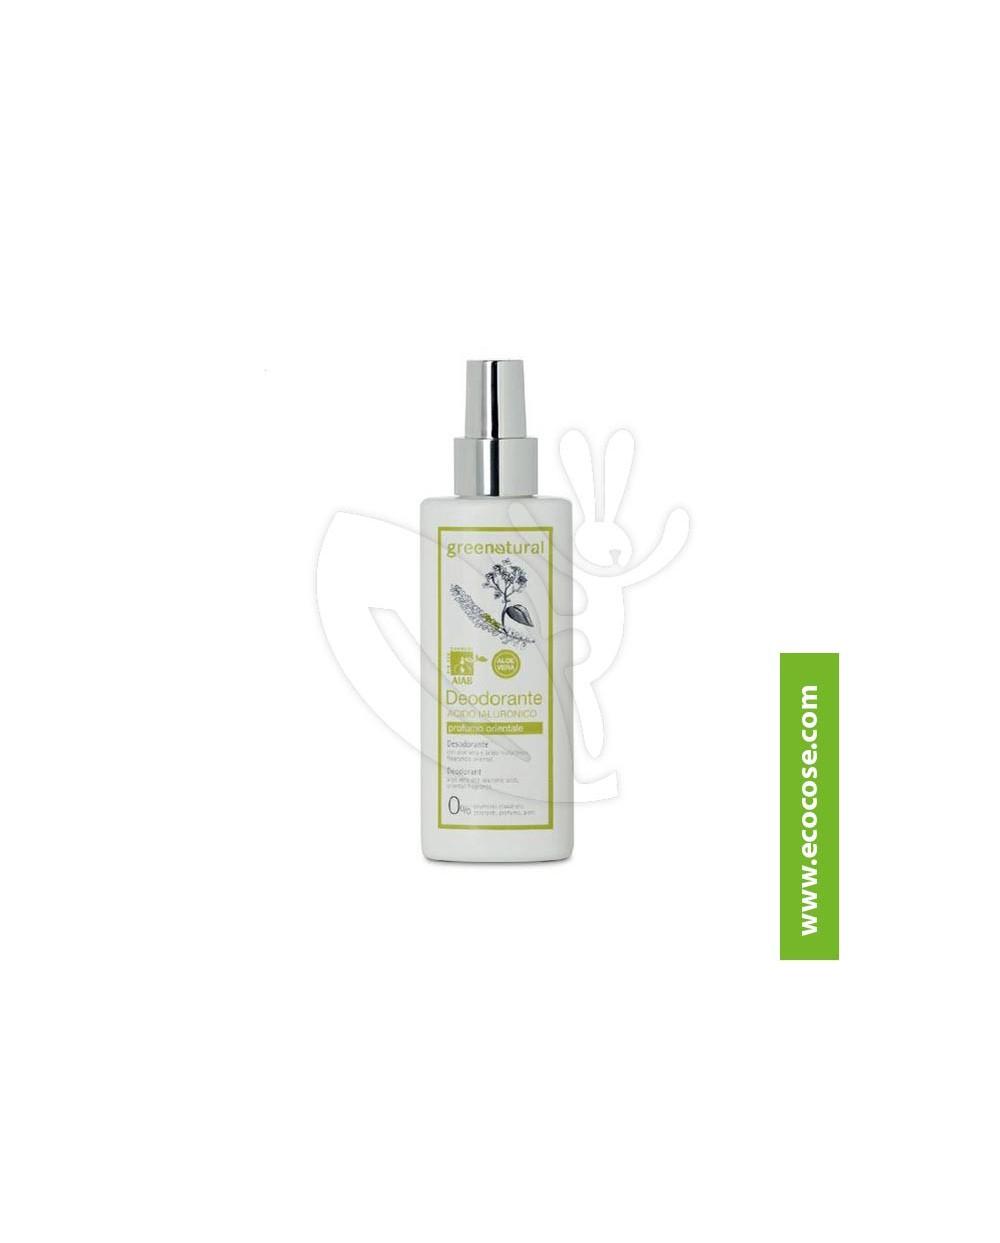 Greenatural - Deodorante SPRAY Acido Ialuronico - Profumo Orientale